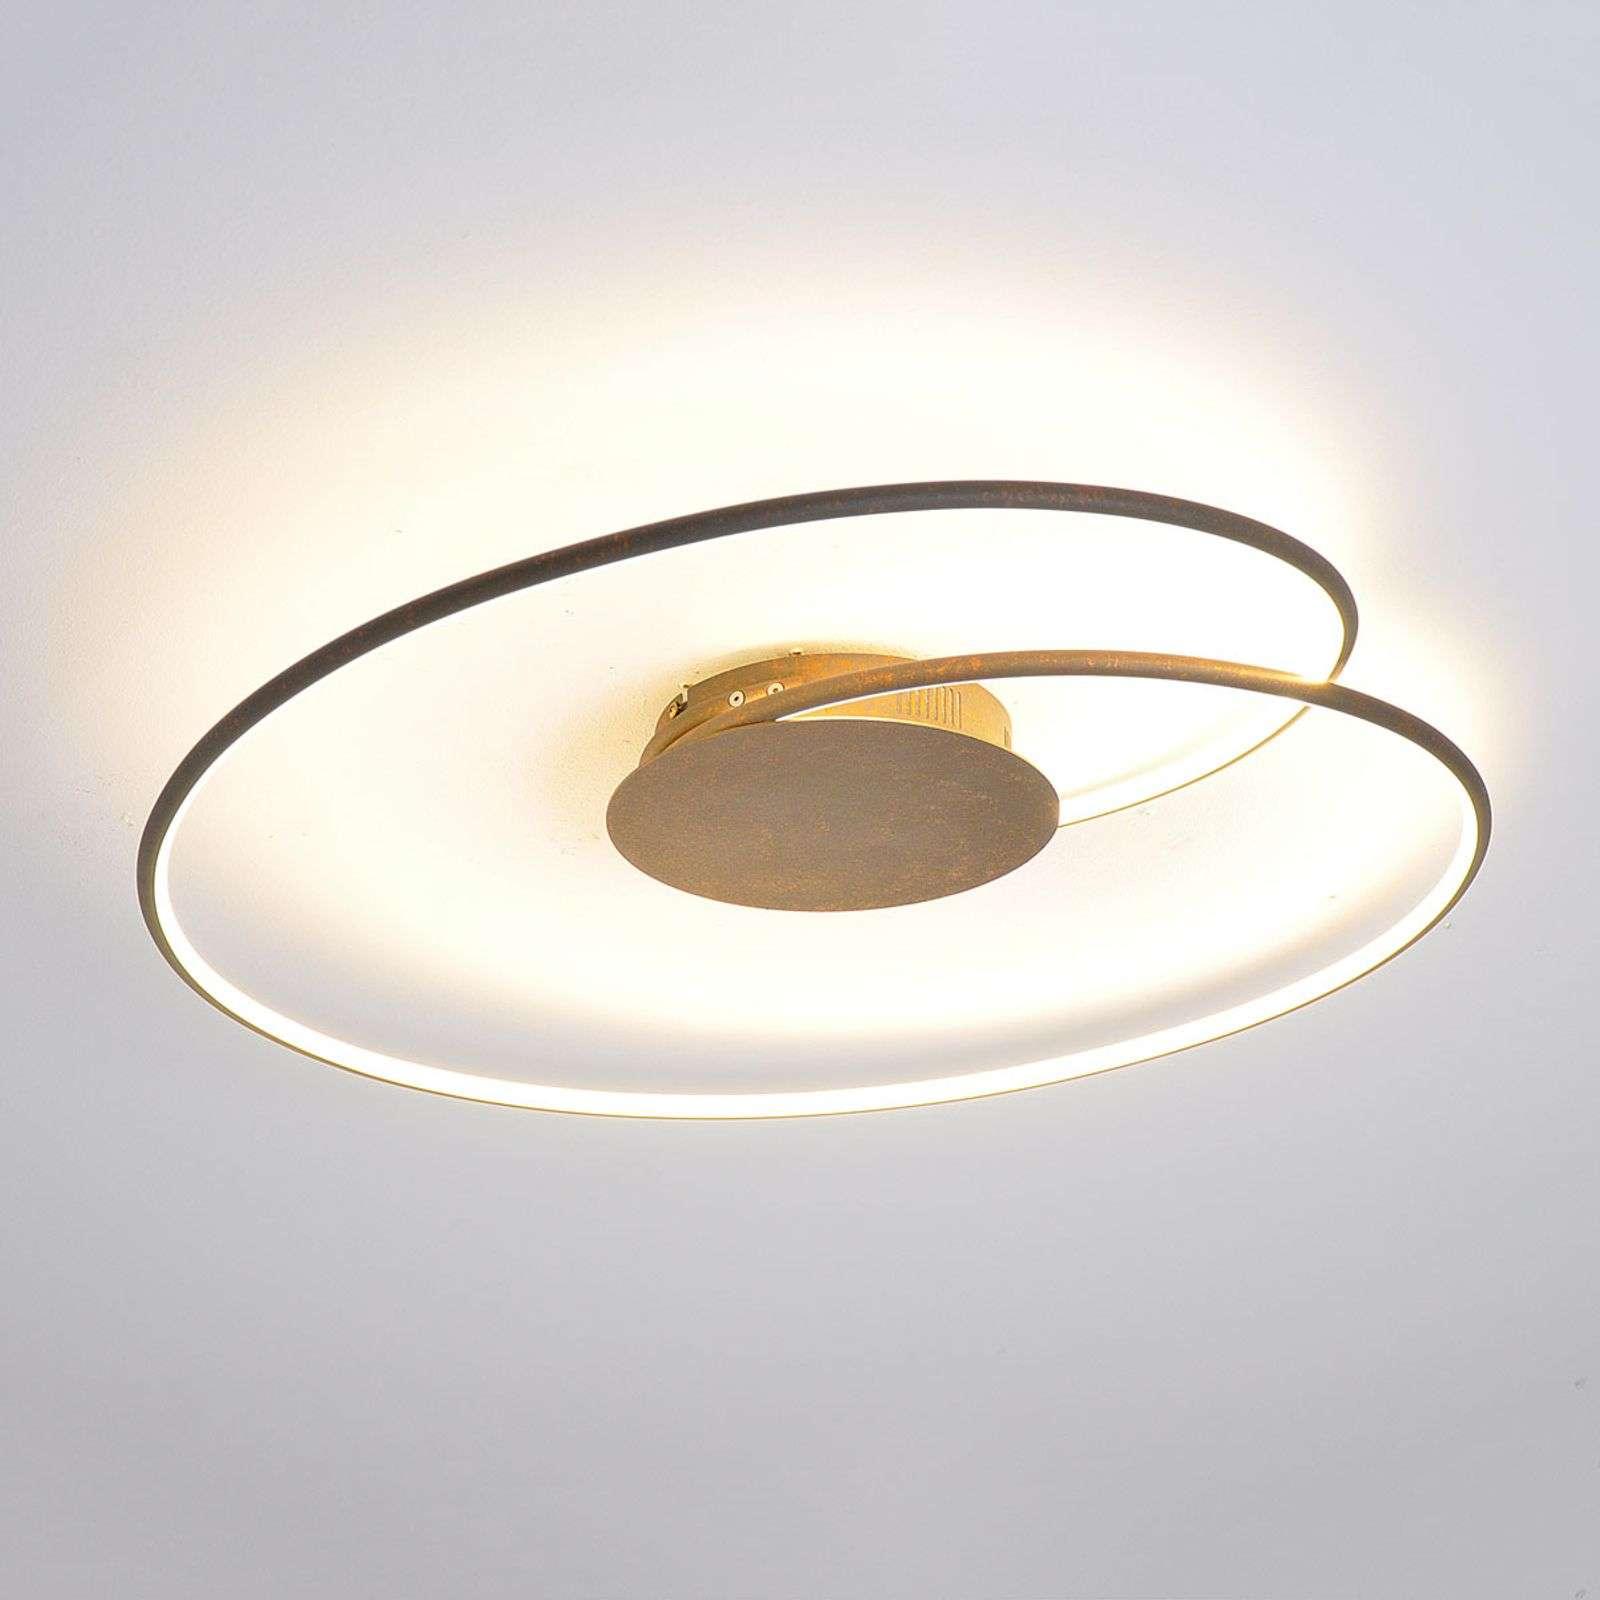 Lampenwelt.com Ravissant plafonnier LED Joline en brun rouille - LAMPENWELT.com